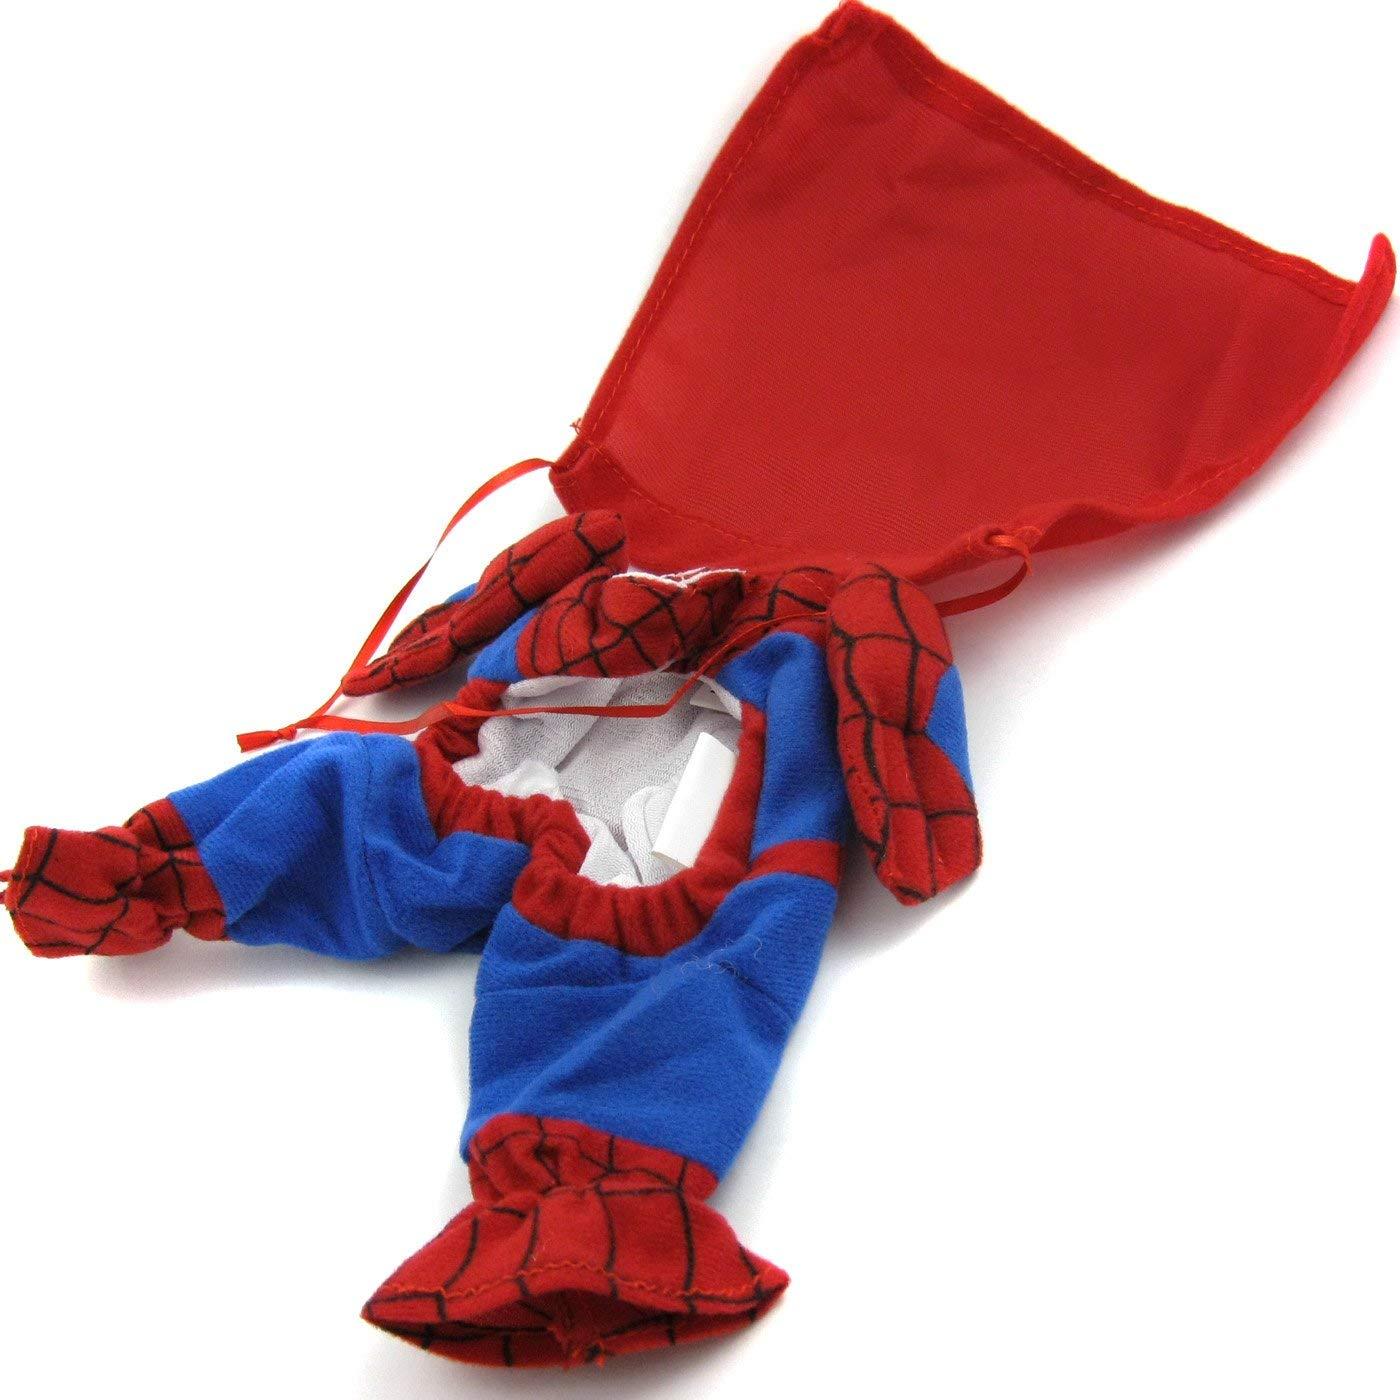 5b68a5a13ba0 Amazon.com: Alfie Pet - Superhero Costume Spiderman - Size: M: Pet Supplies